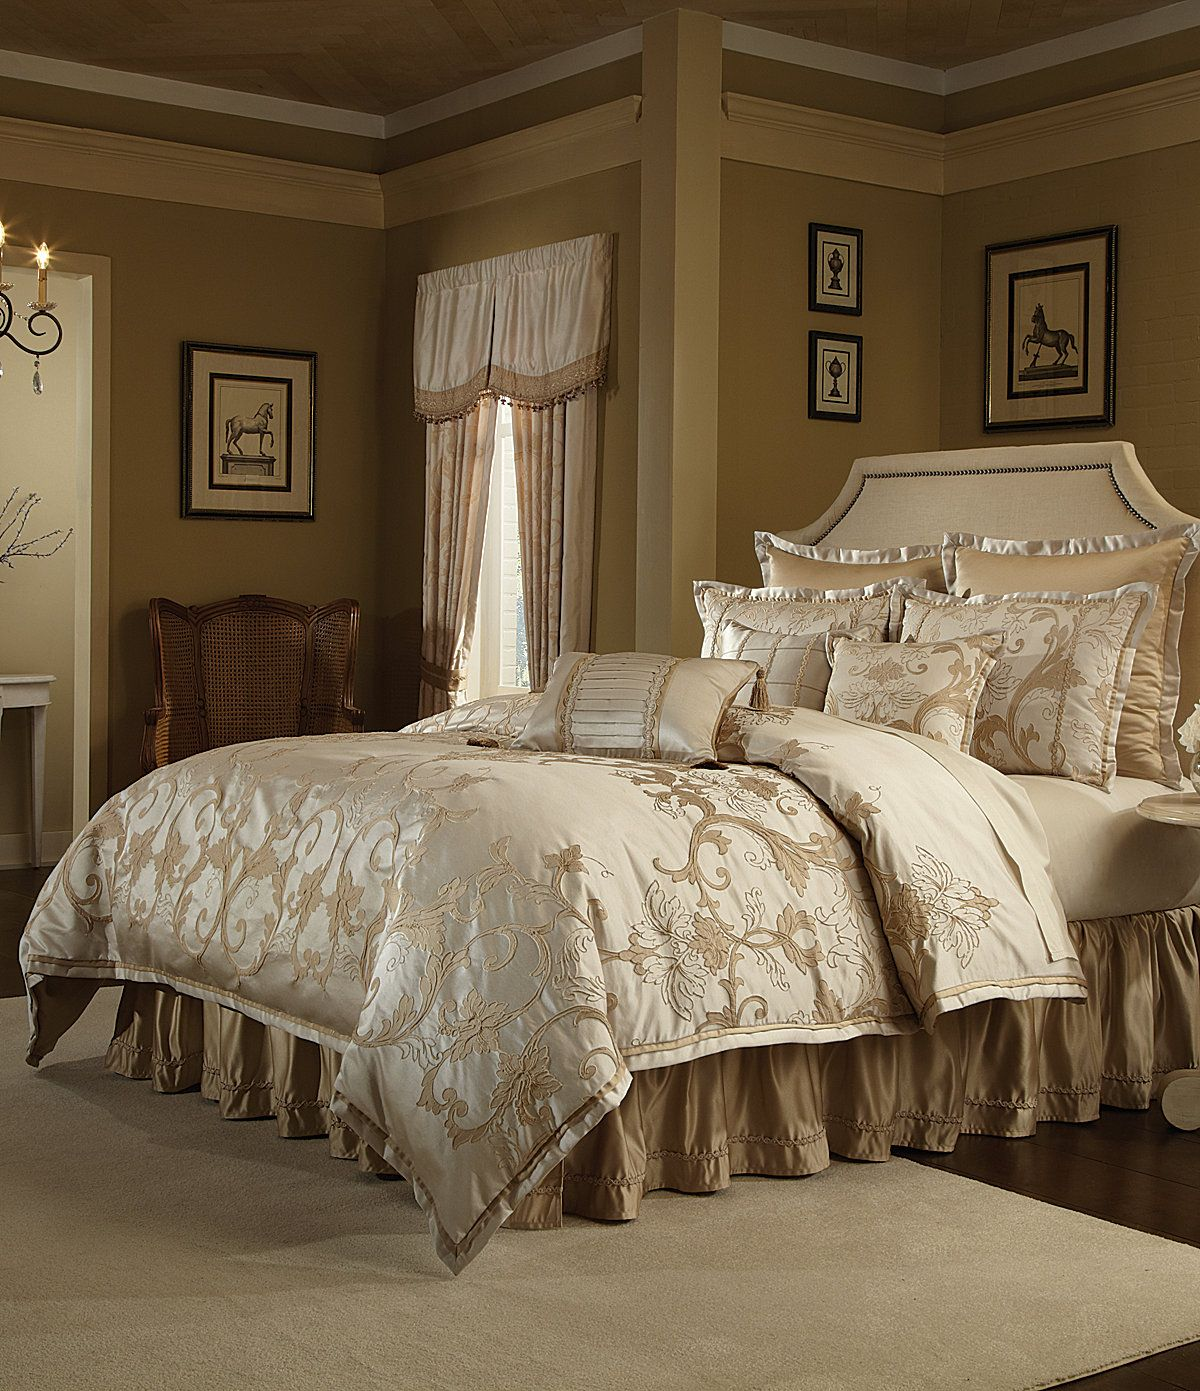 Bedrooms · Veratex Verandah Bedding Collection | Dillards.com